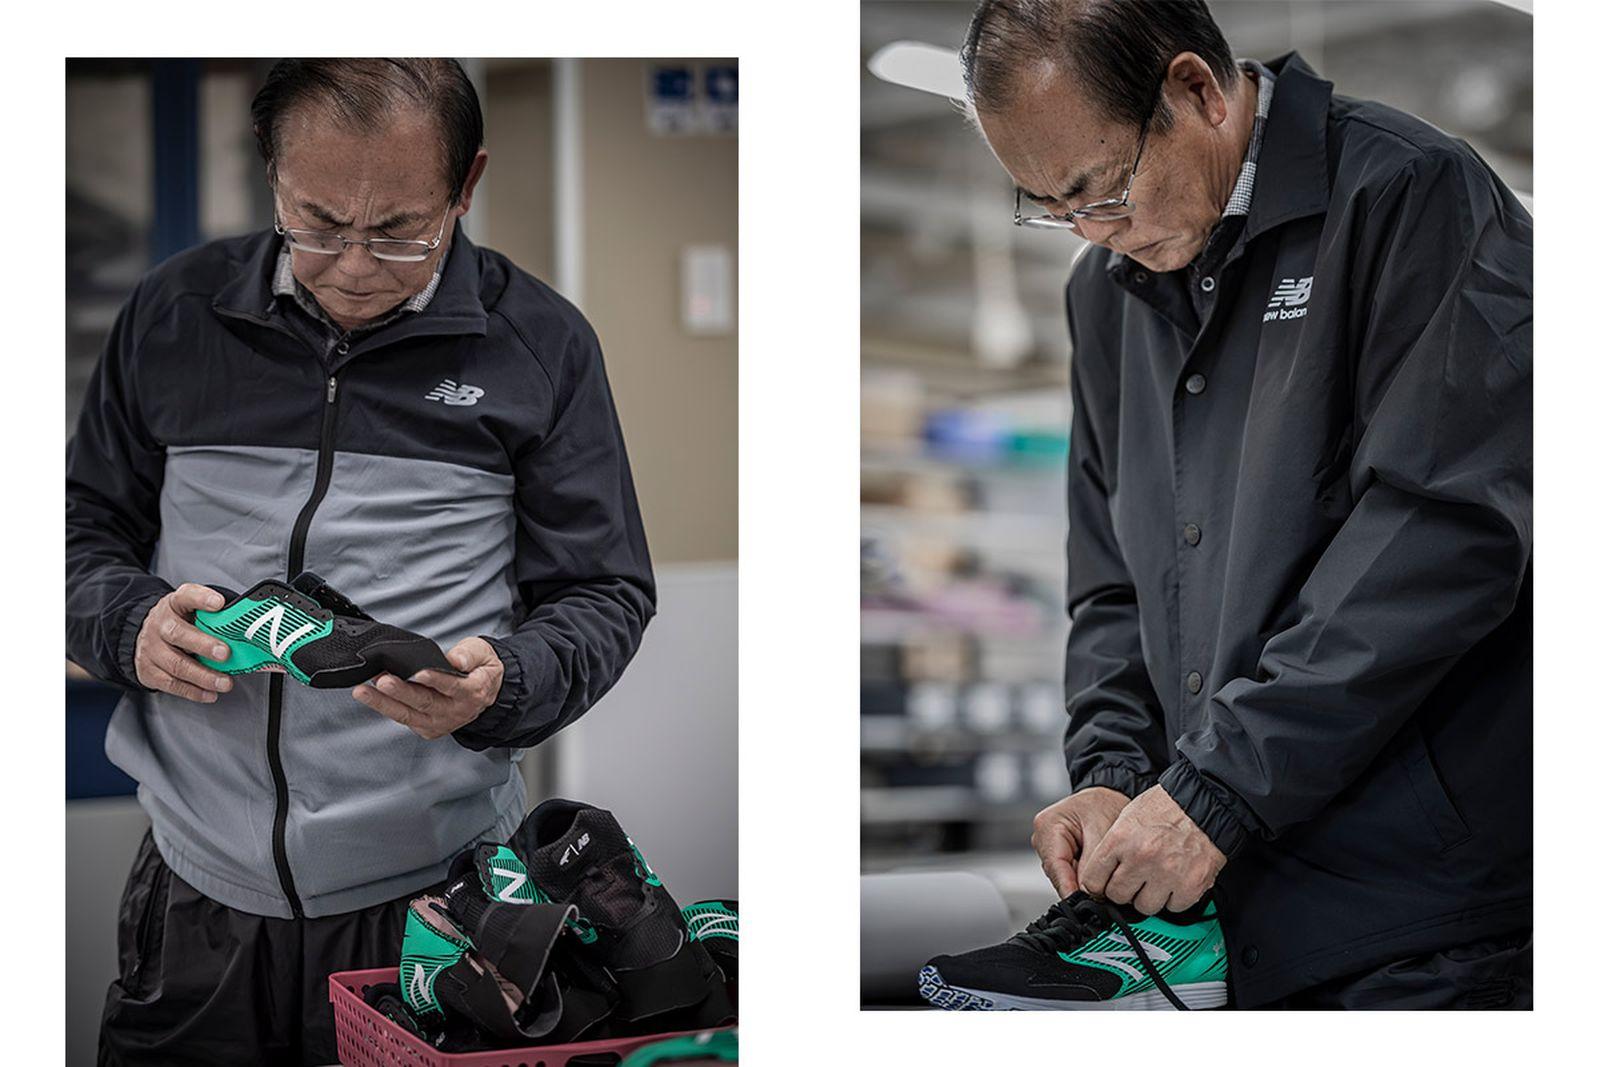 japans next great marathon runner got blessed god shoes03 New Balance running shoes